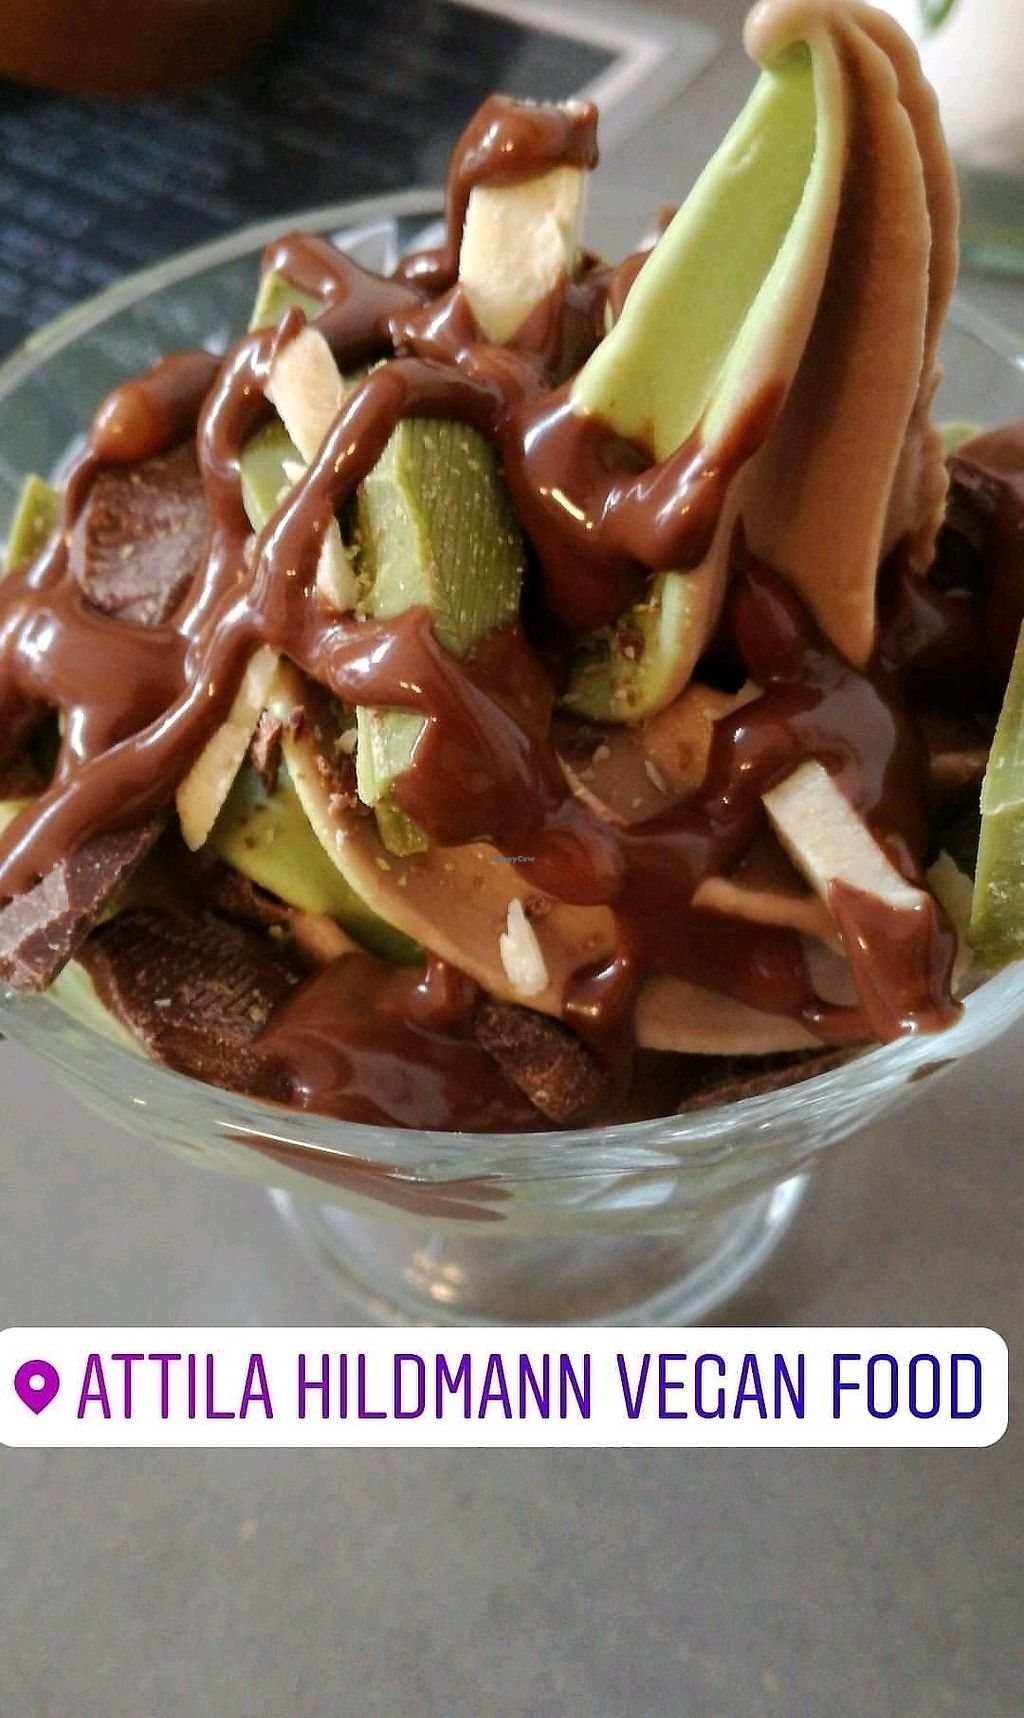 "Photo of Attila Hildmann Vegan Food  by <a href=""/members/profile/Anamarta"">Anamarta</a> <br/>ice cream <br/> October 31, 2017  - <a href='/contact/abuse/image/91807/320356'>Report</a>"